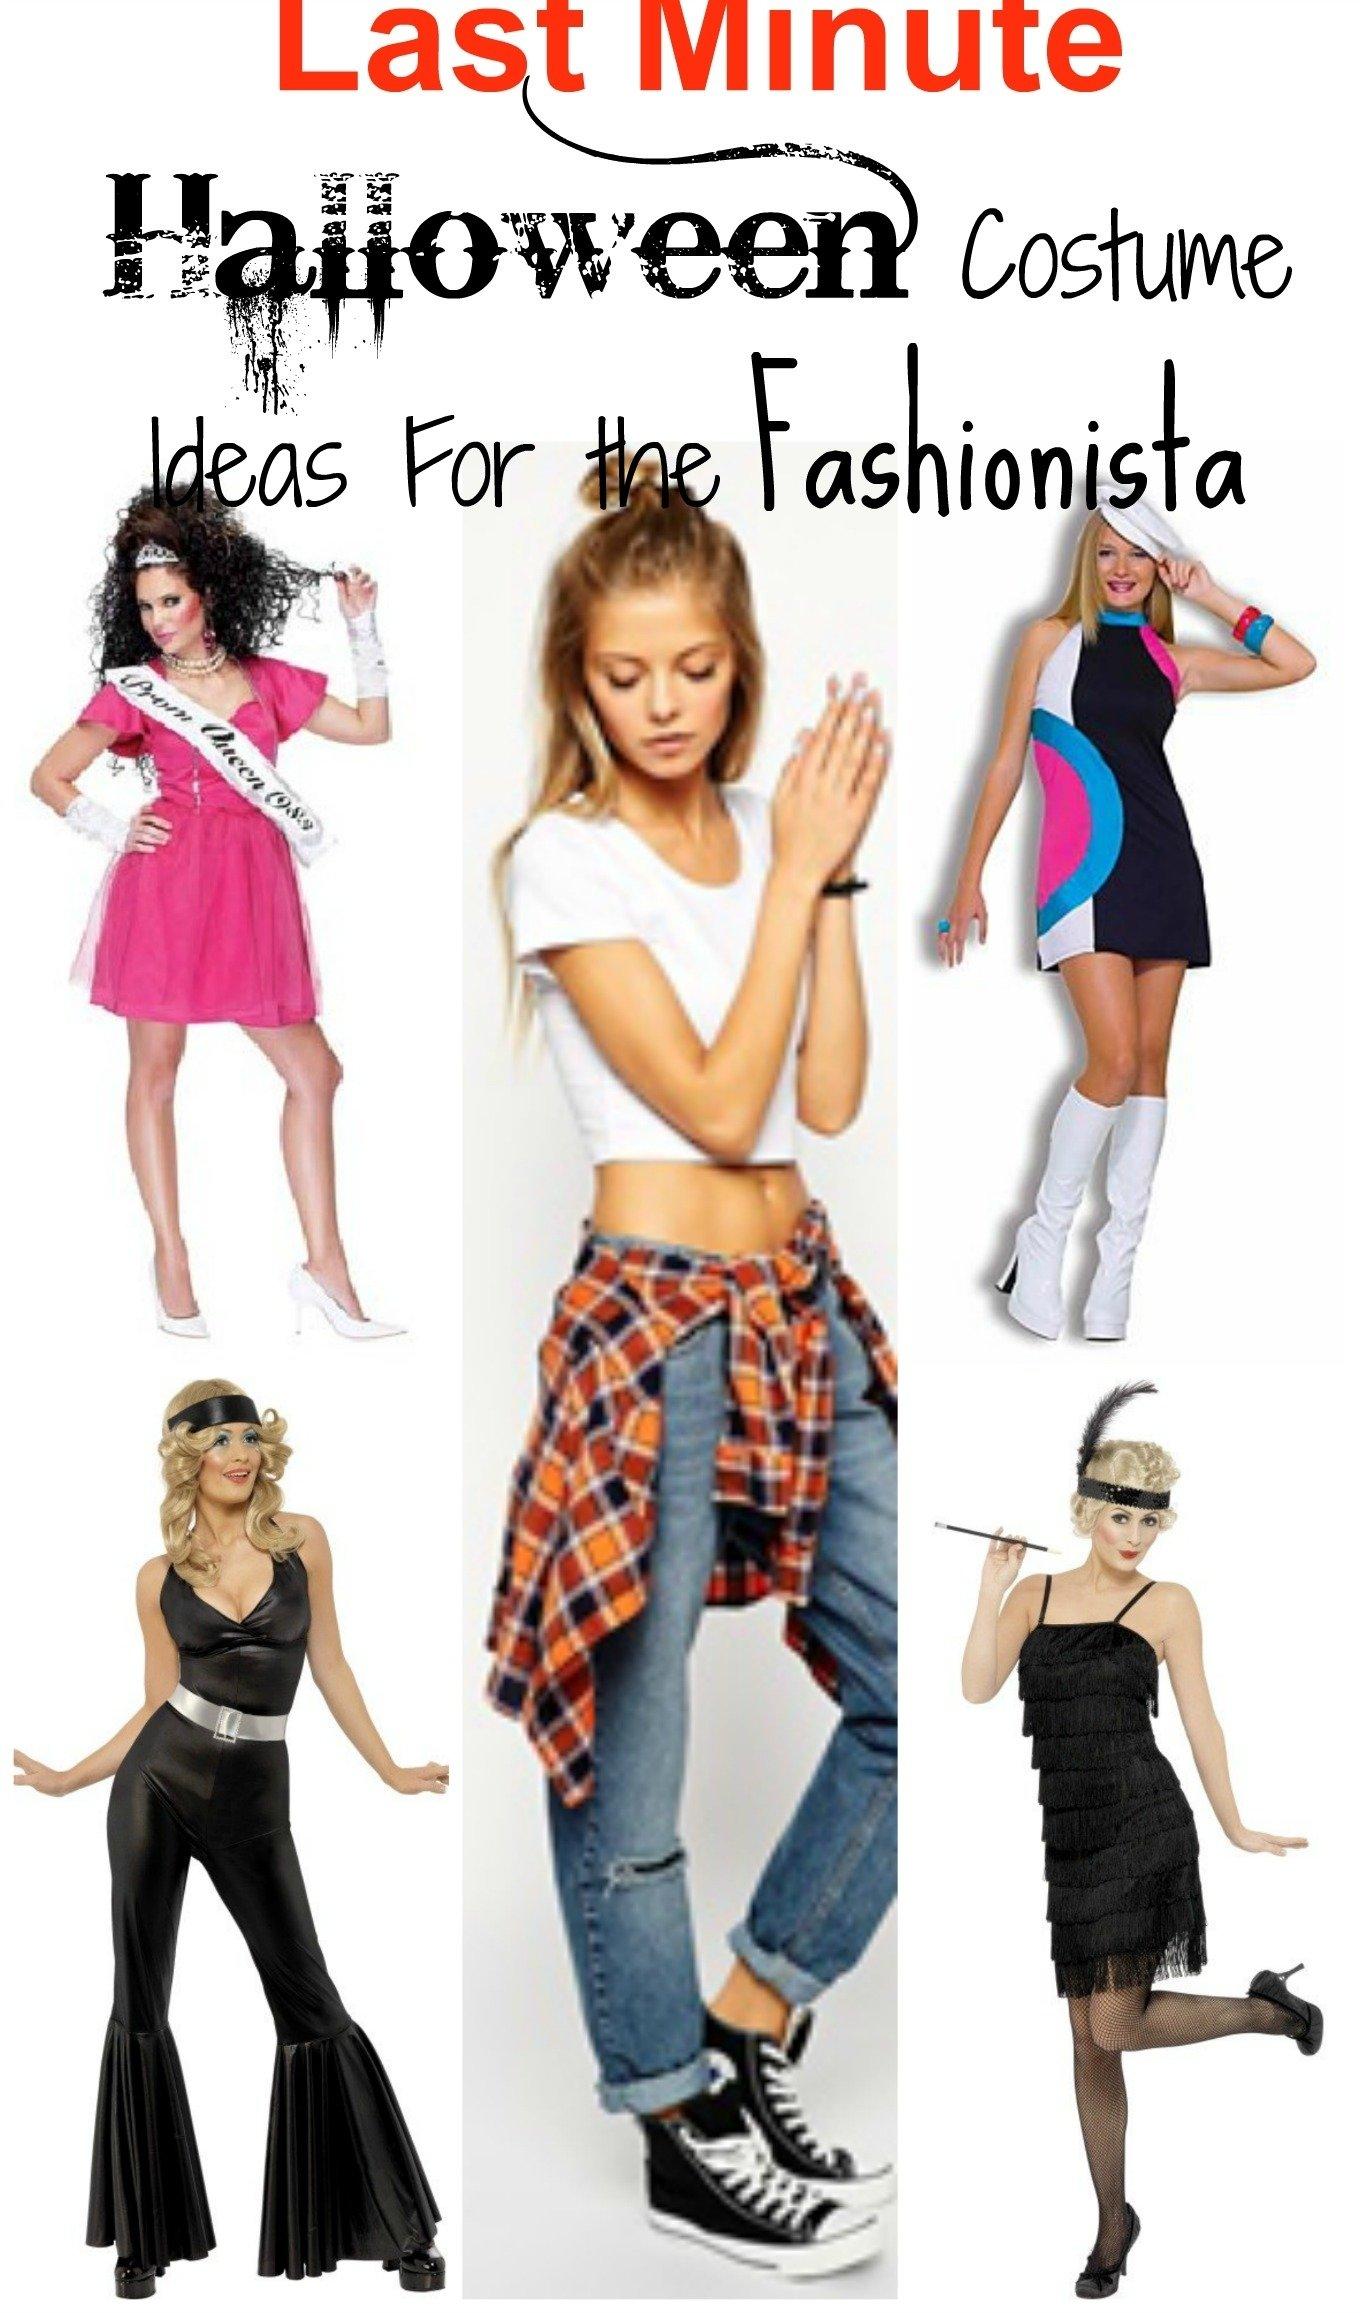 10 Unique Last Minute Costume Ideas Adults 5 last minute halloween costume ideas for the fashionista 6 2020